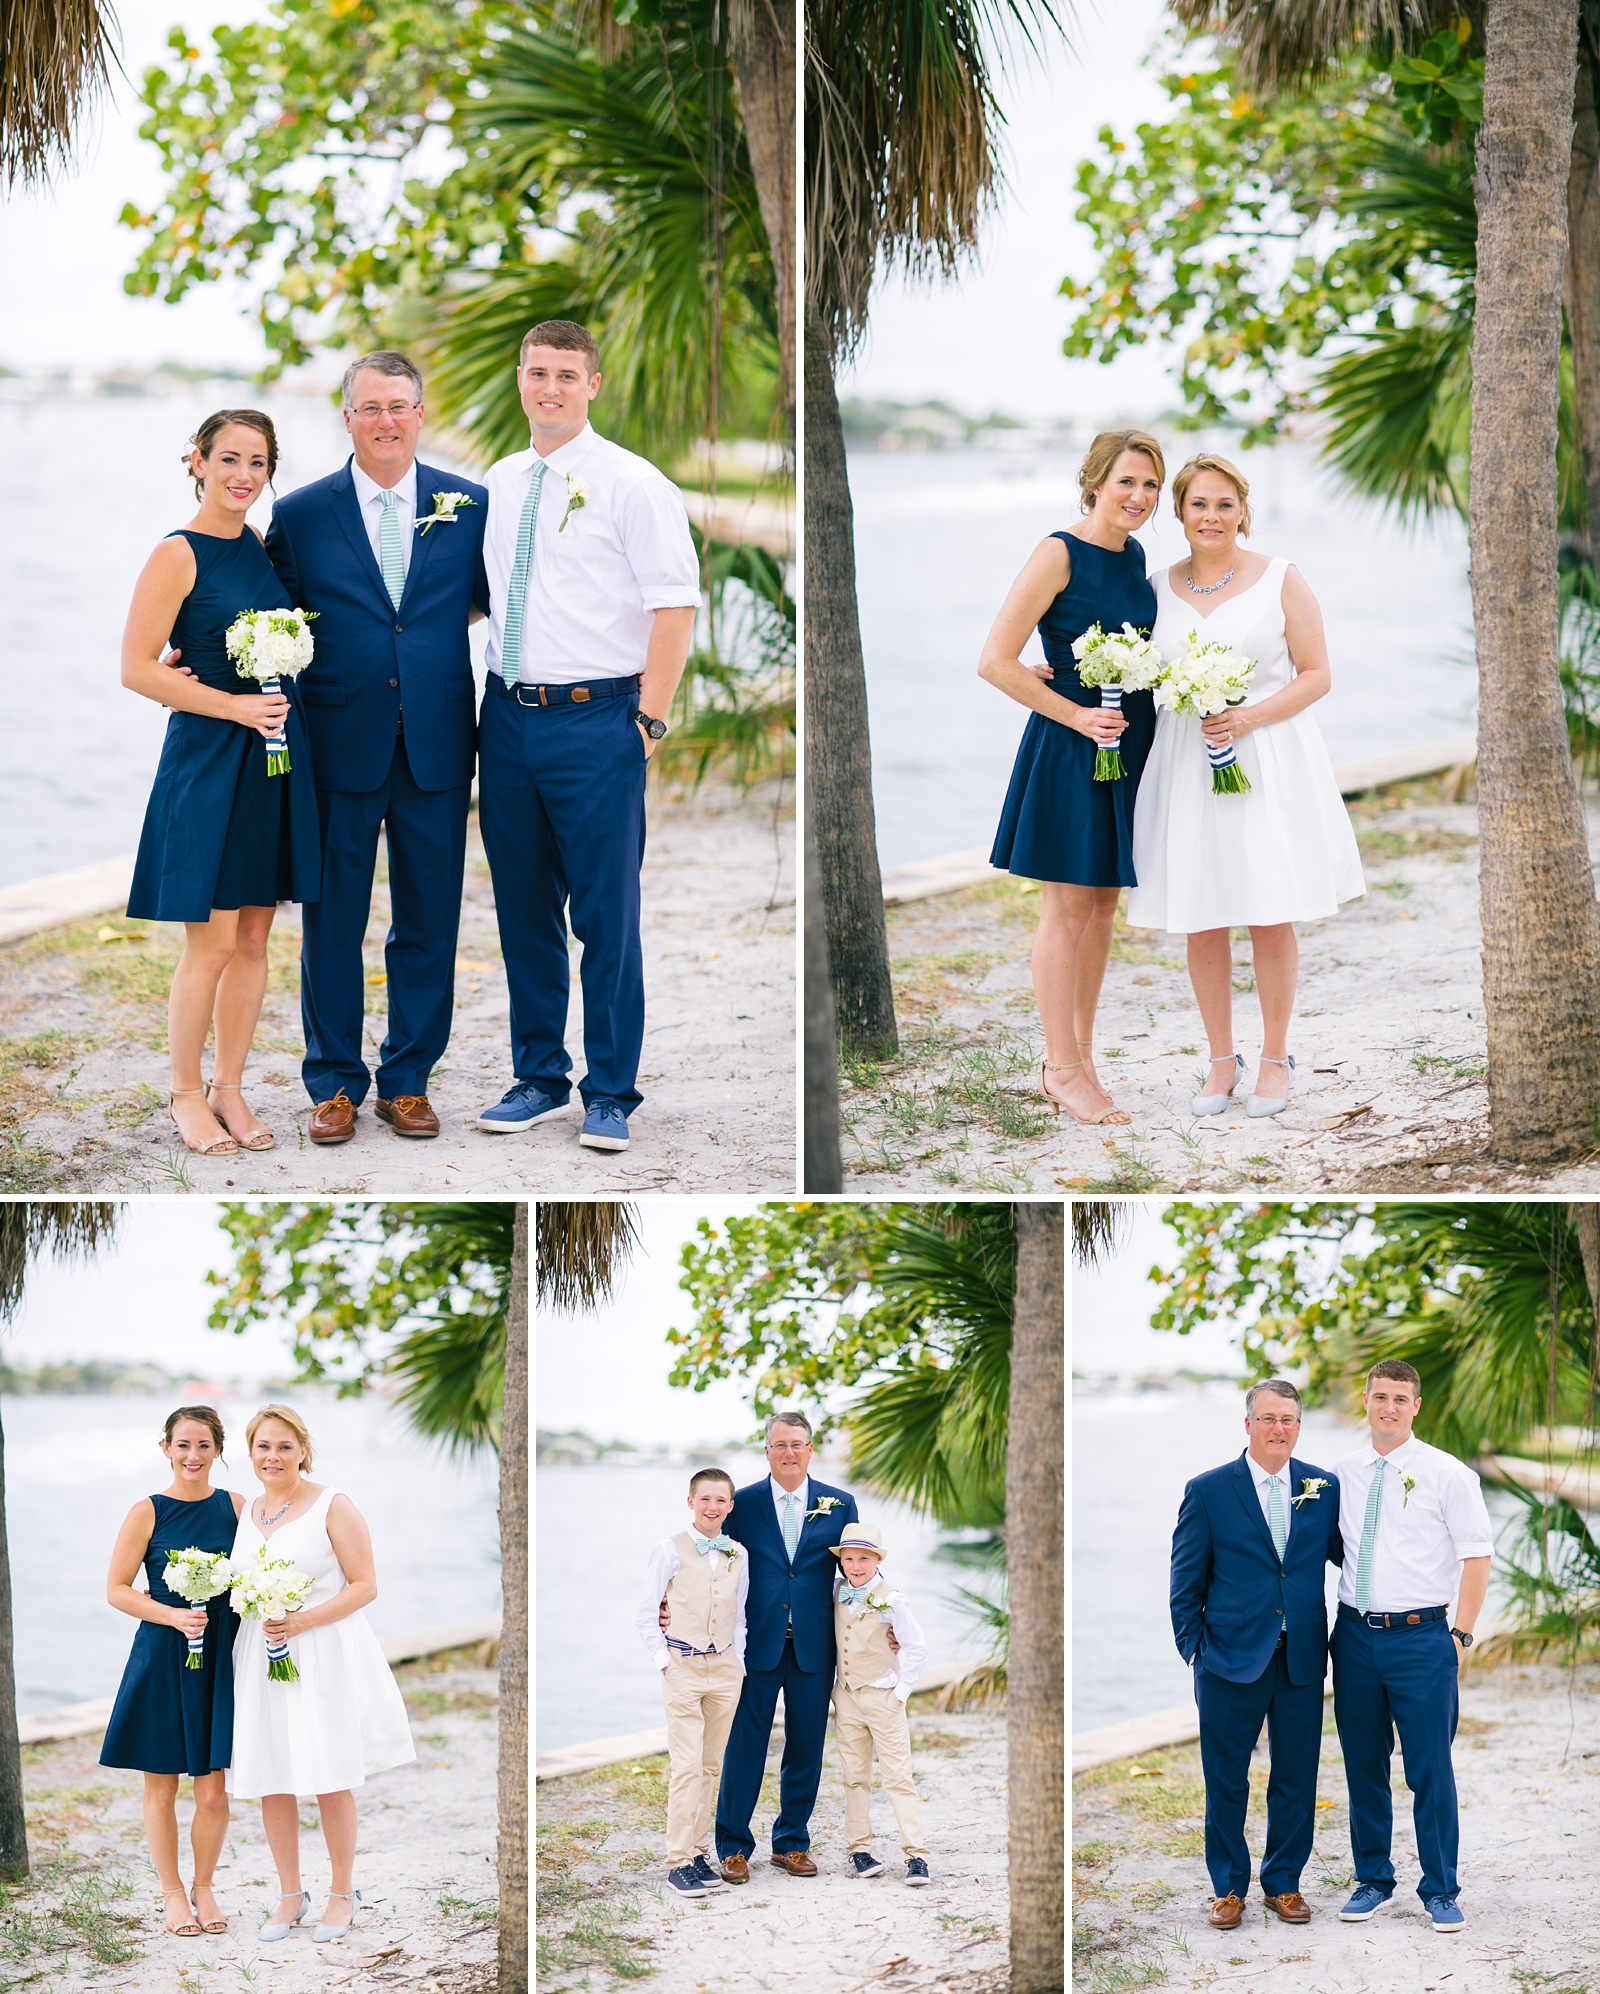 21-los-angeles-wedding-photographer-fort-lauderdale.jpg